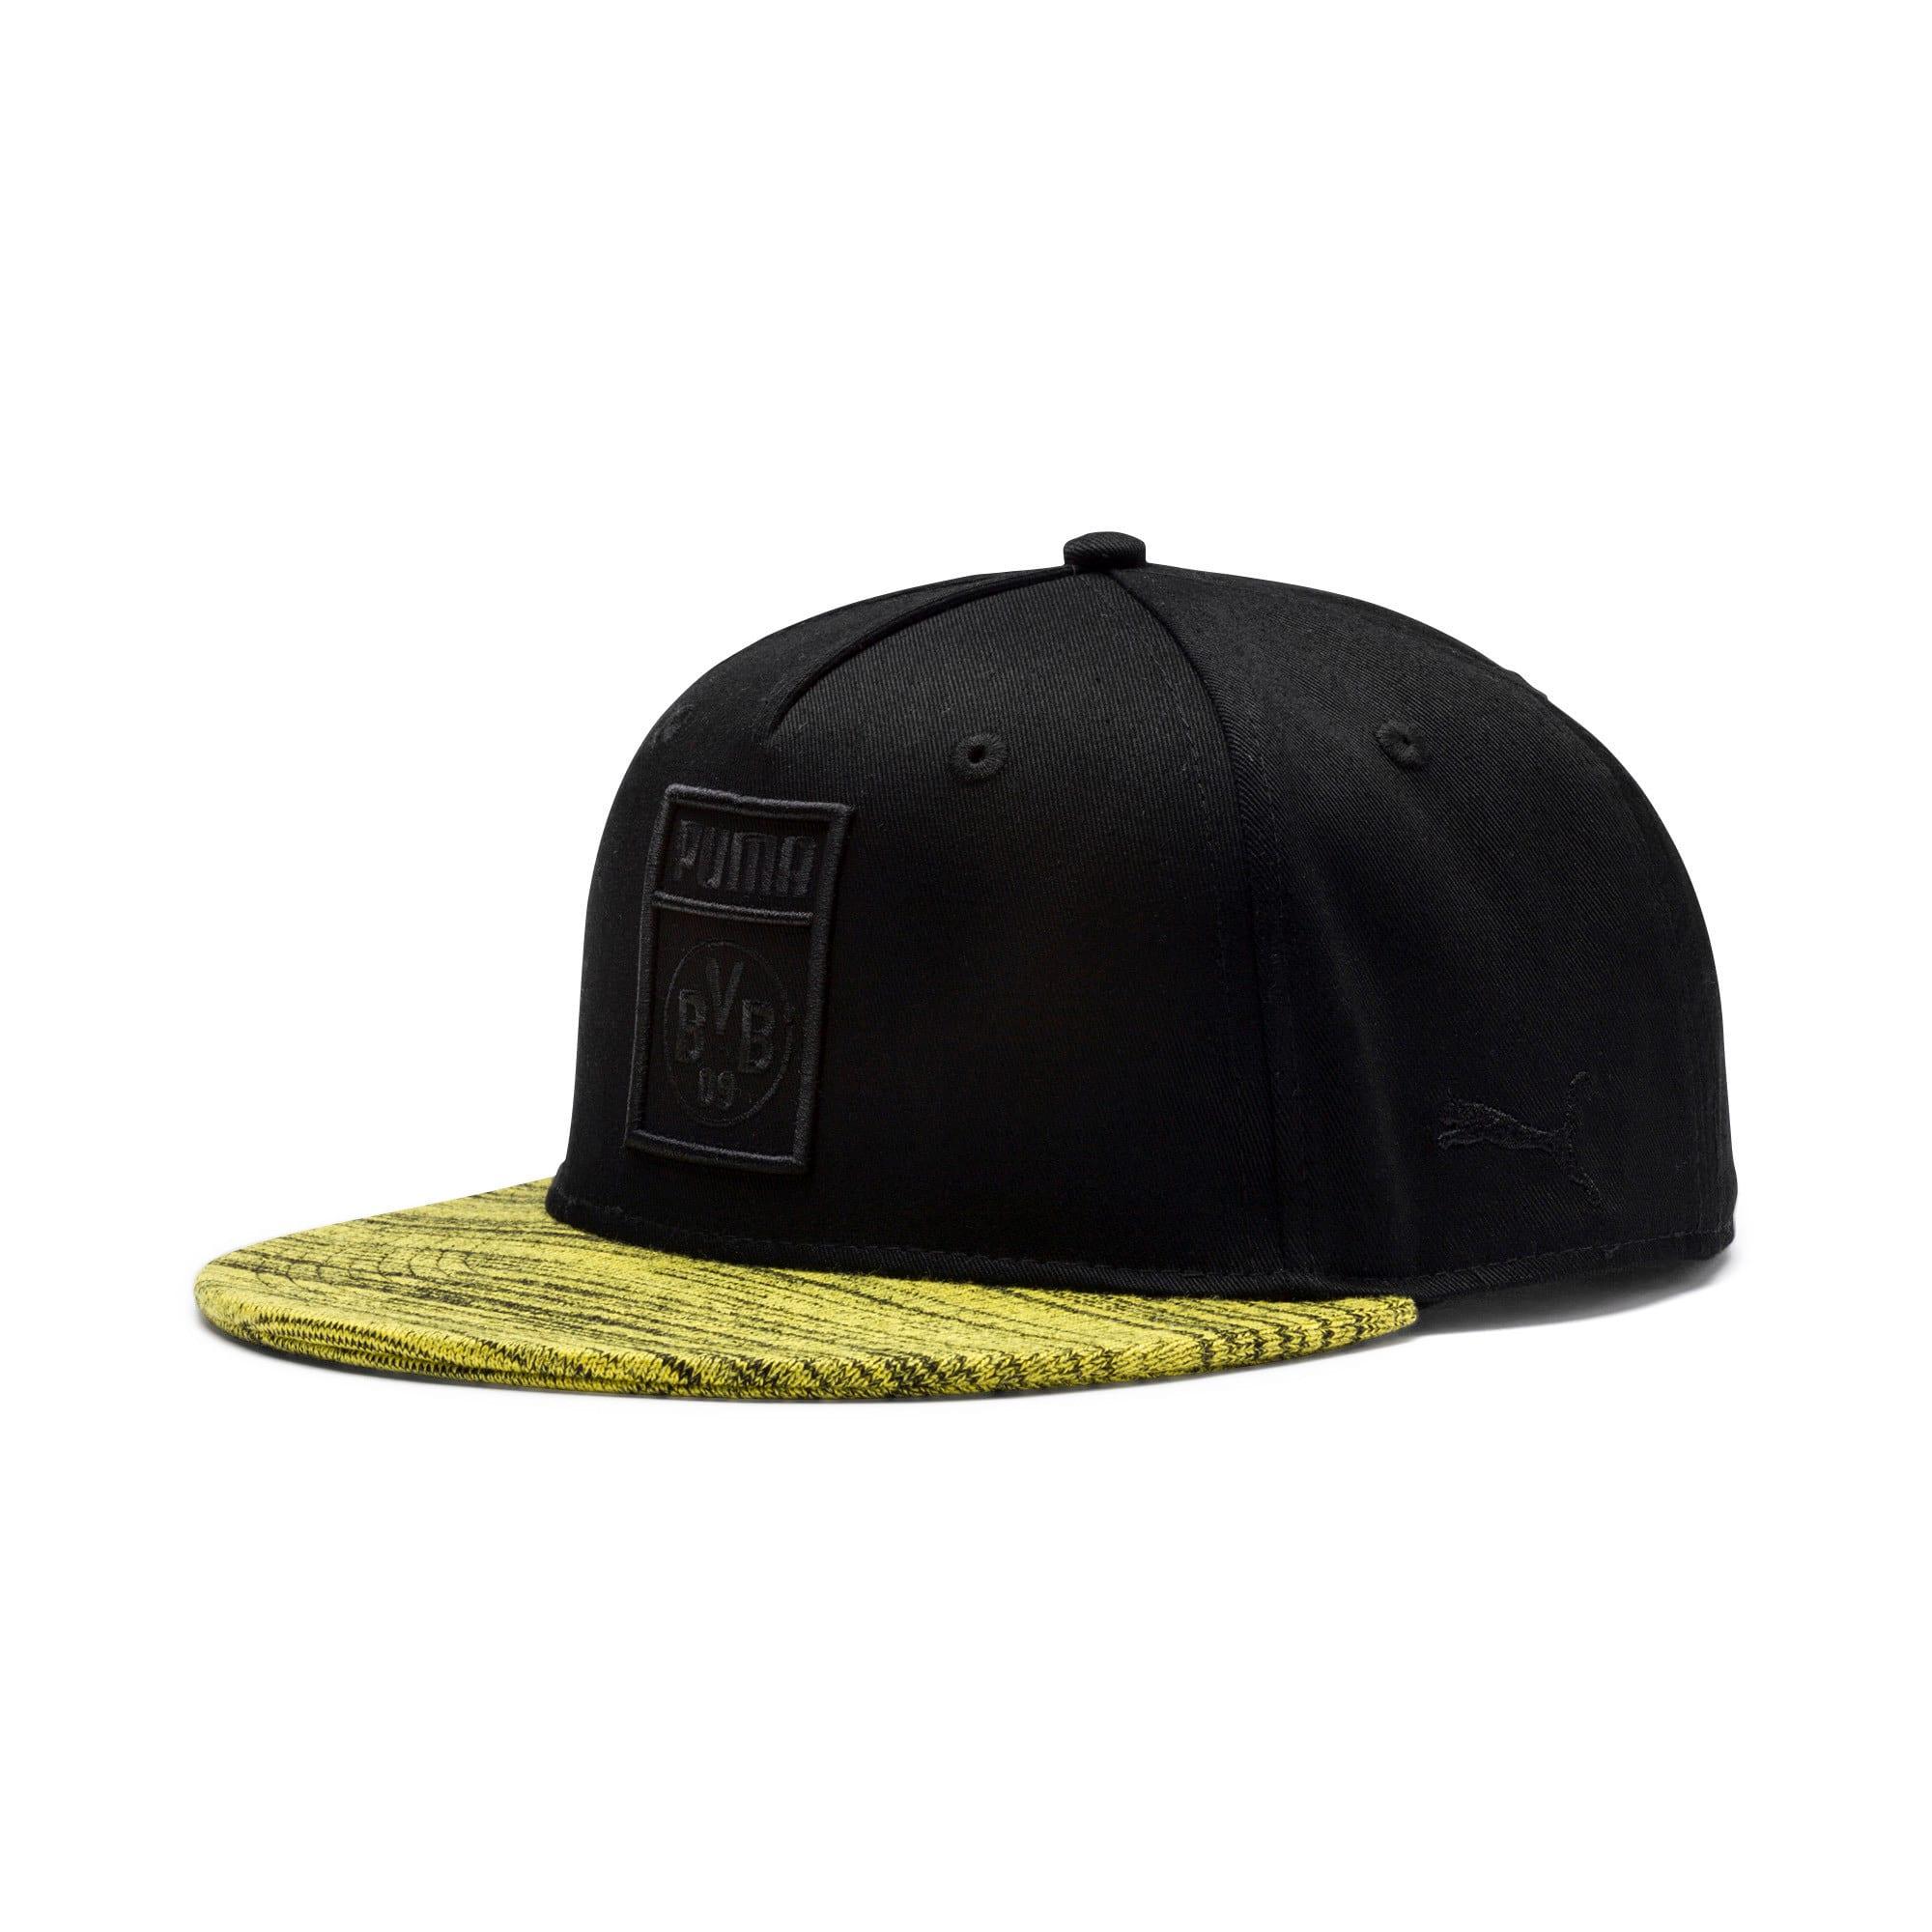 Thumbnail 1 of BVB Flatbrim Hat, Puma Black, medium